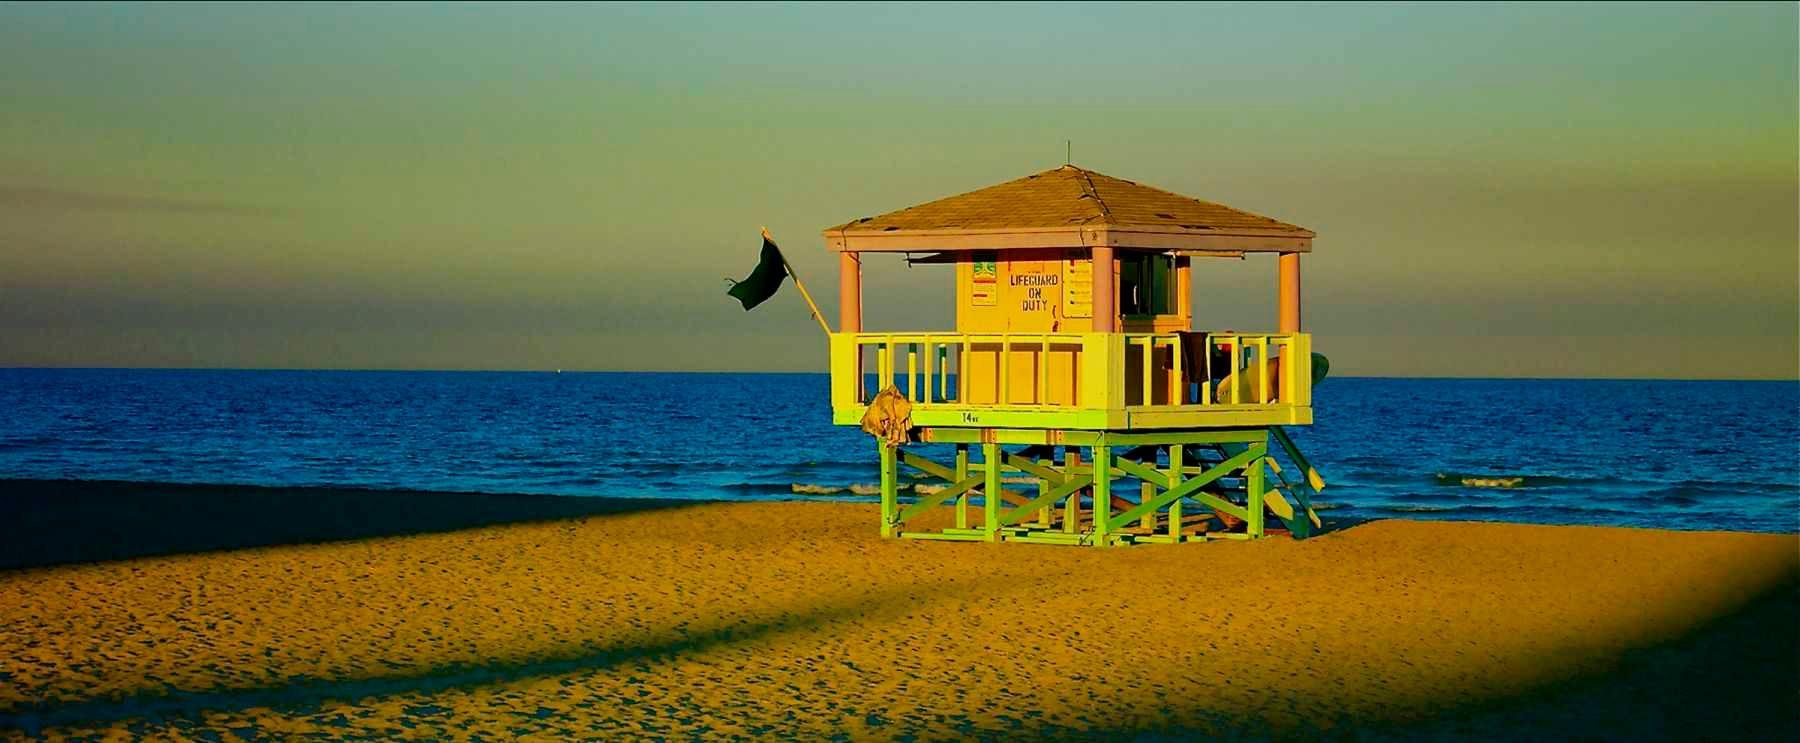 1south_beach_life_guard_shack